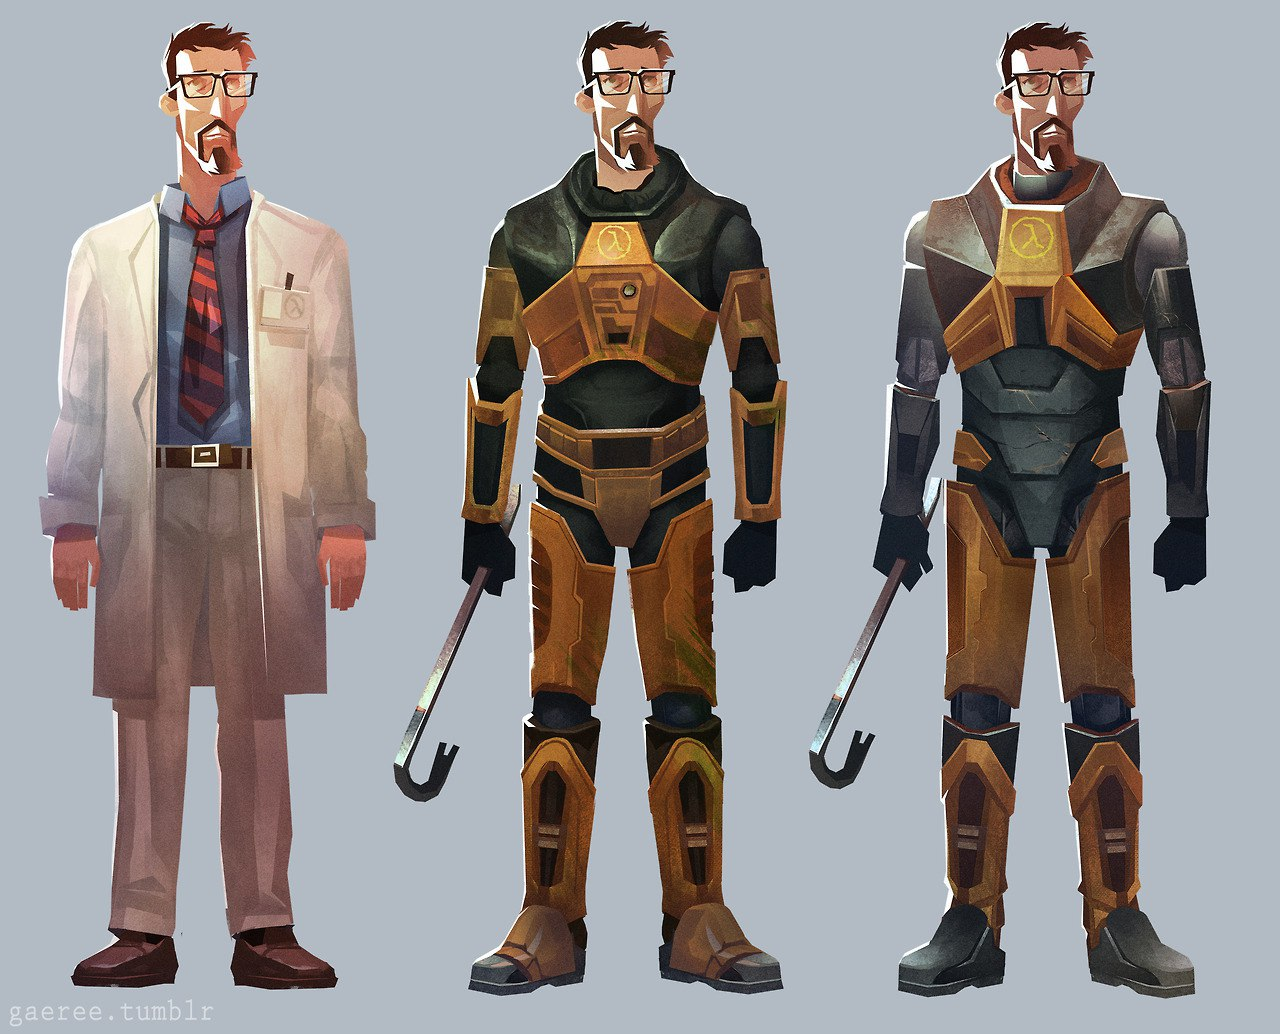 Снимки за играта Half Life  - Page 3 Q04ht_10